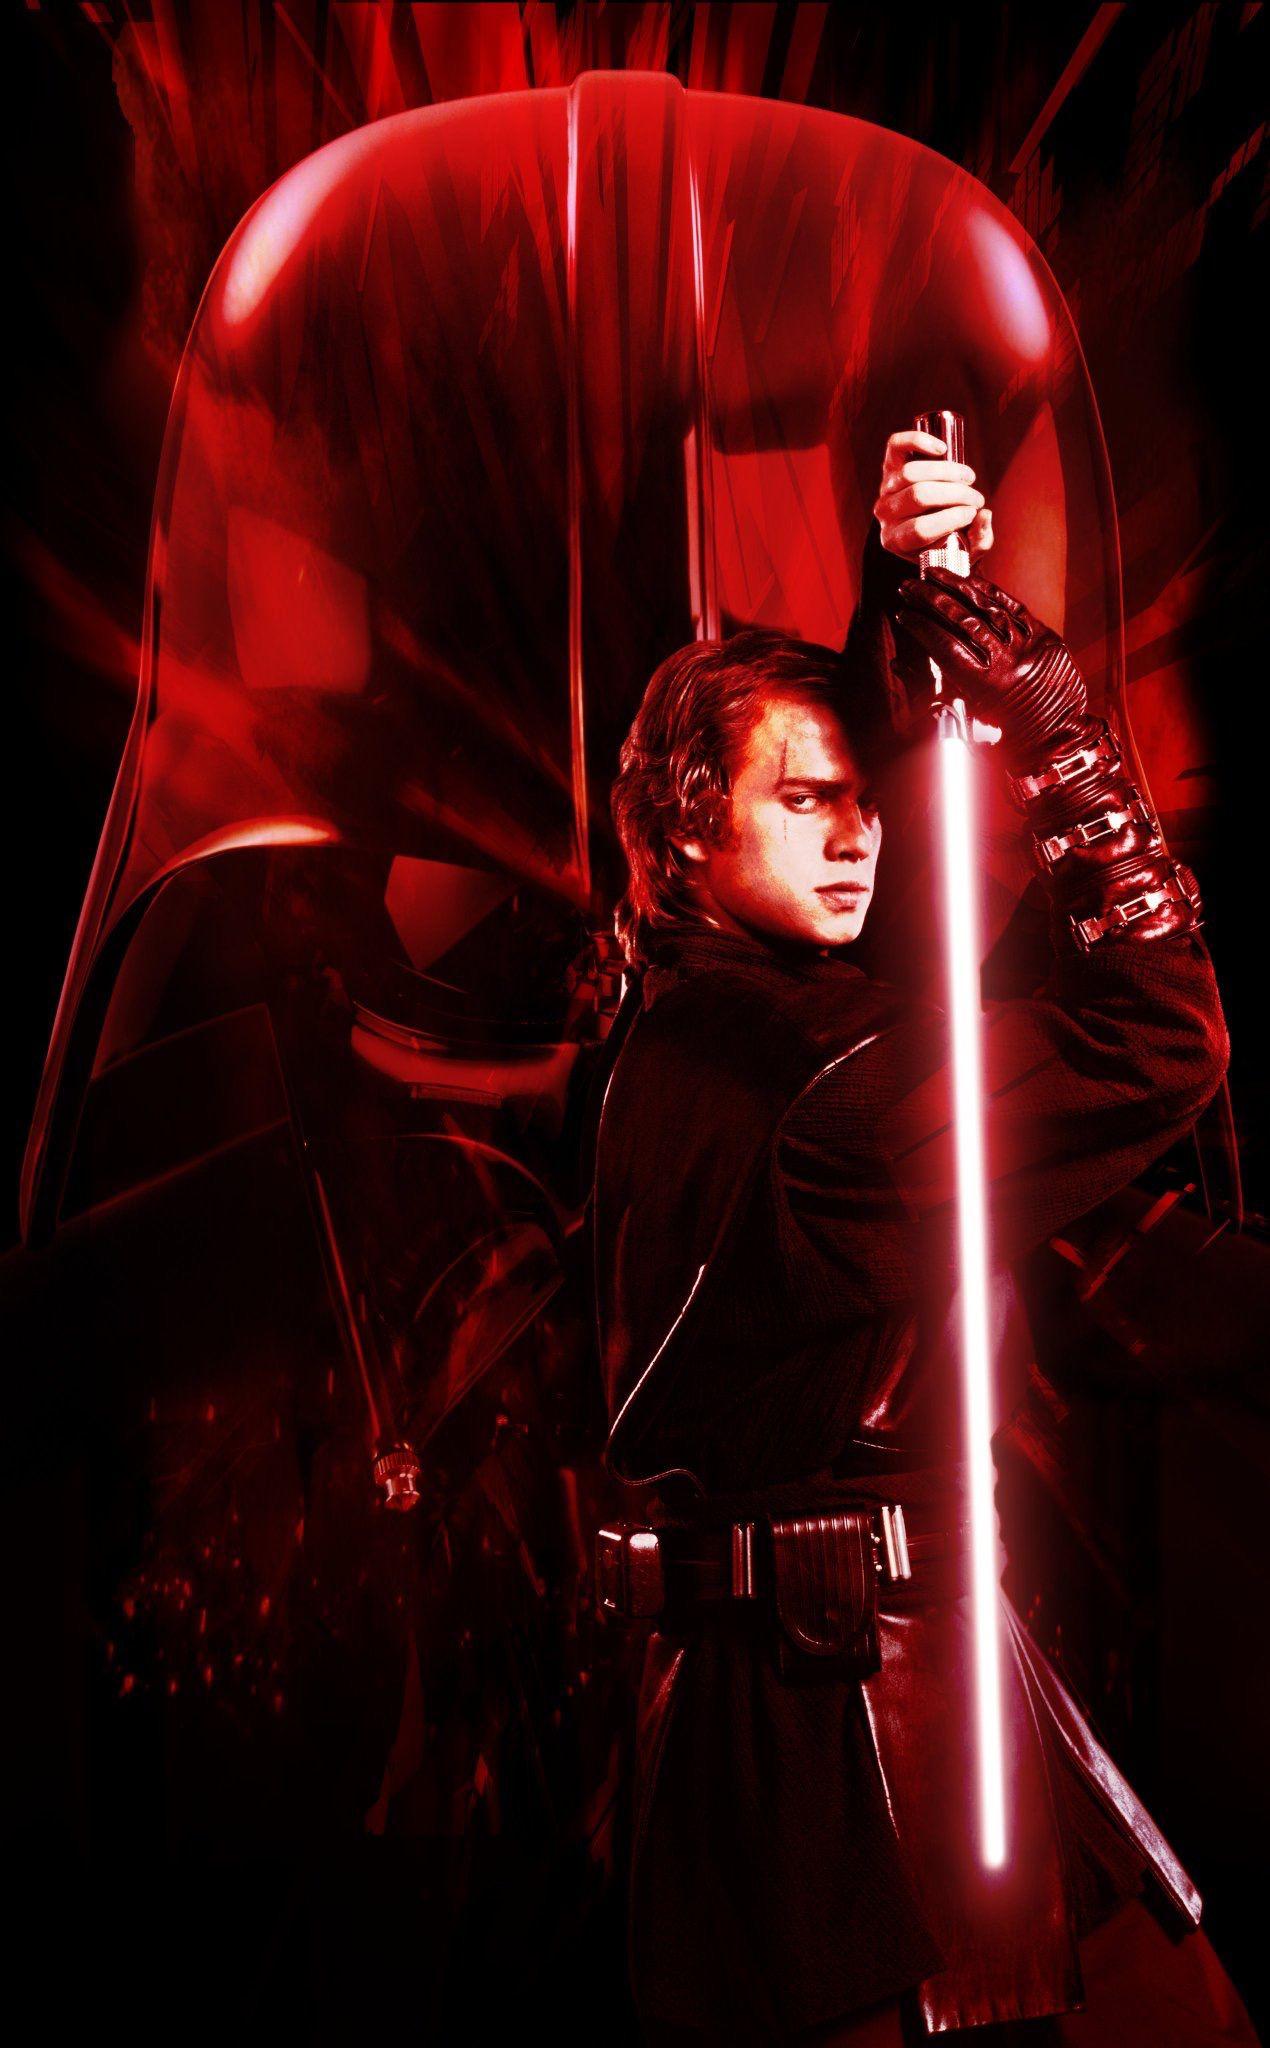 Star Wars Anakin Skywalker Star Wars Anakin Star Wars Pictures Star Wars Characters Poster